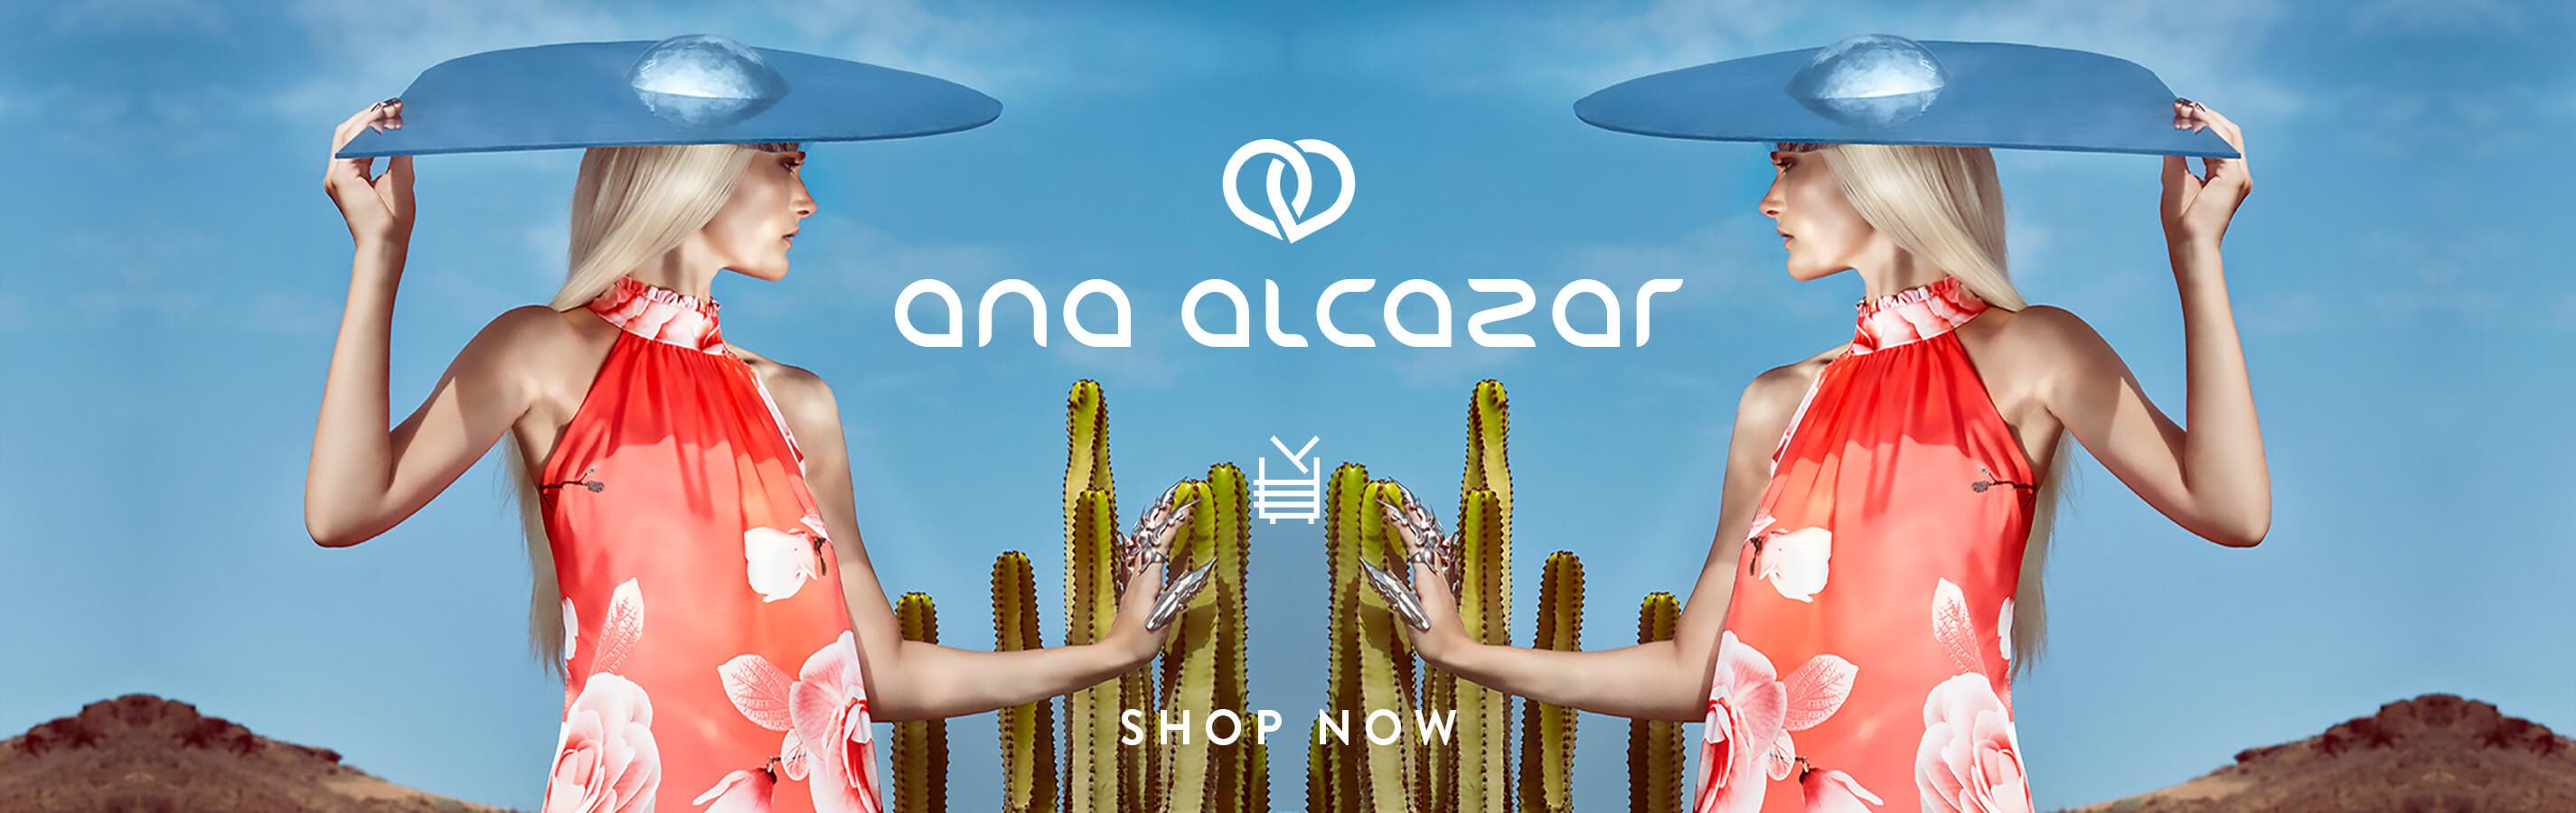 Banner_Image_Ana_Alcazar